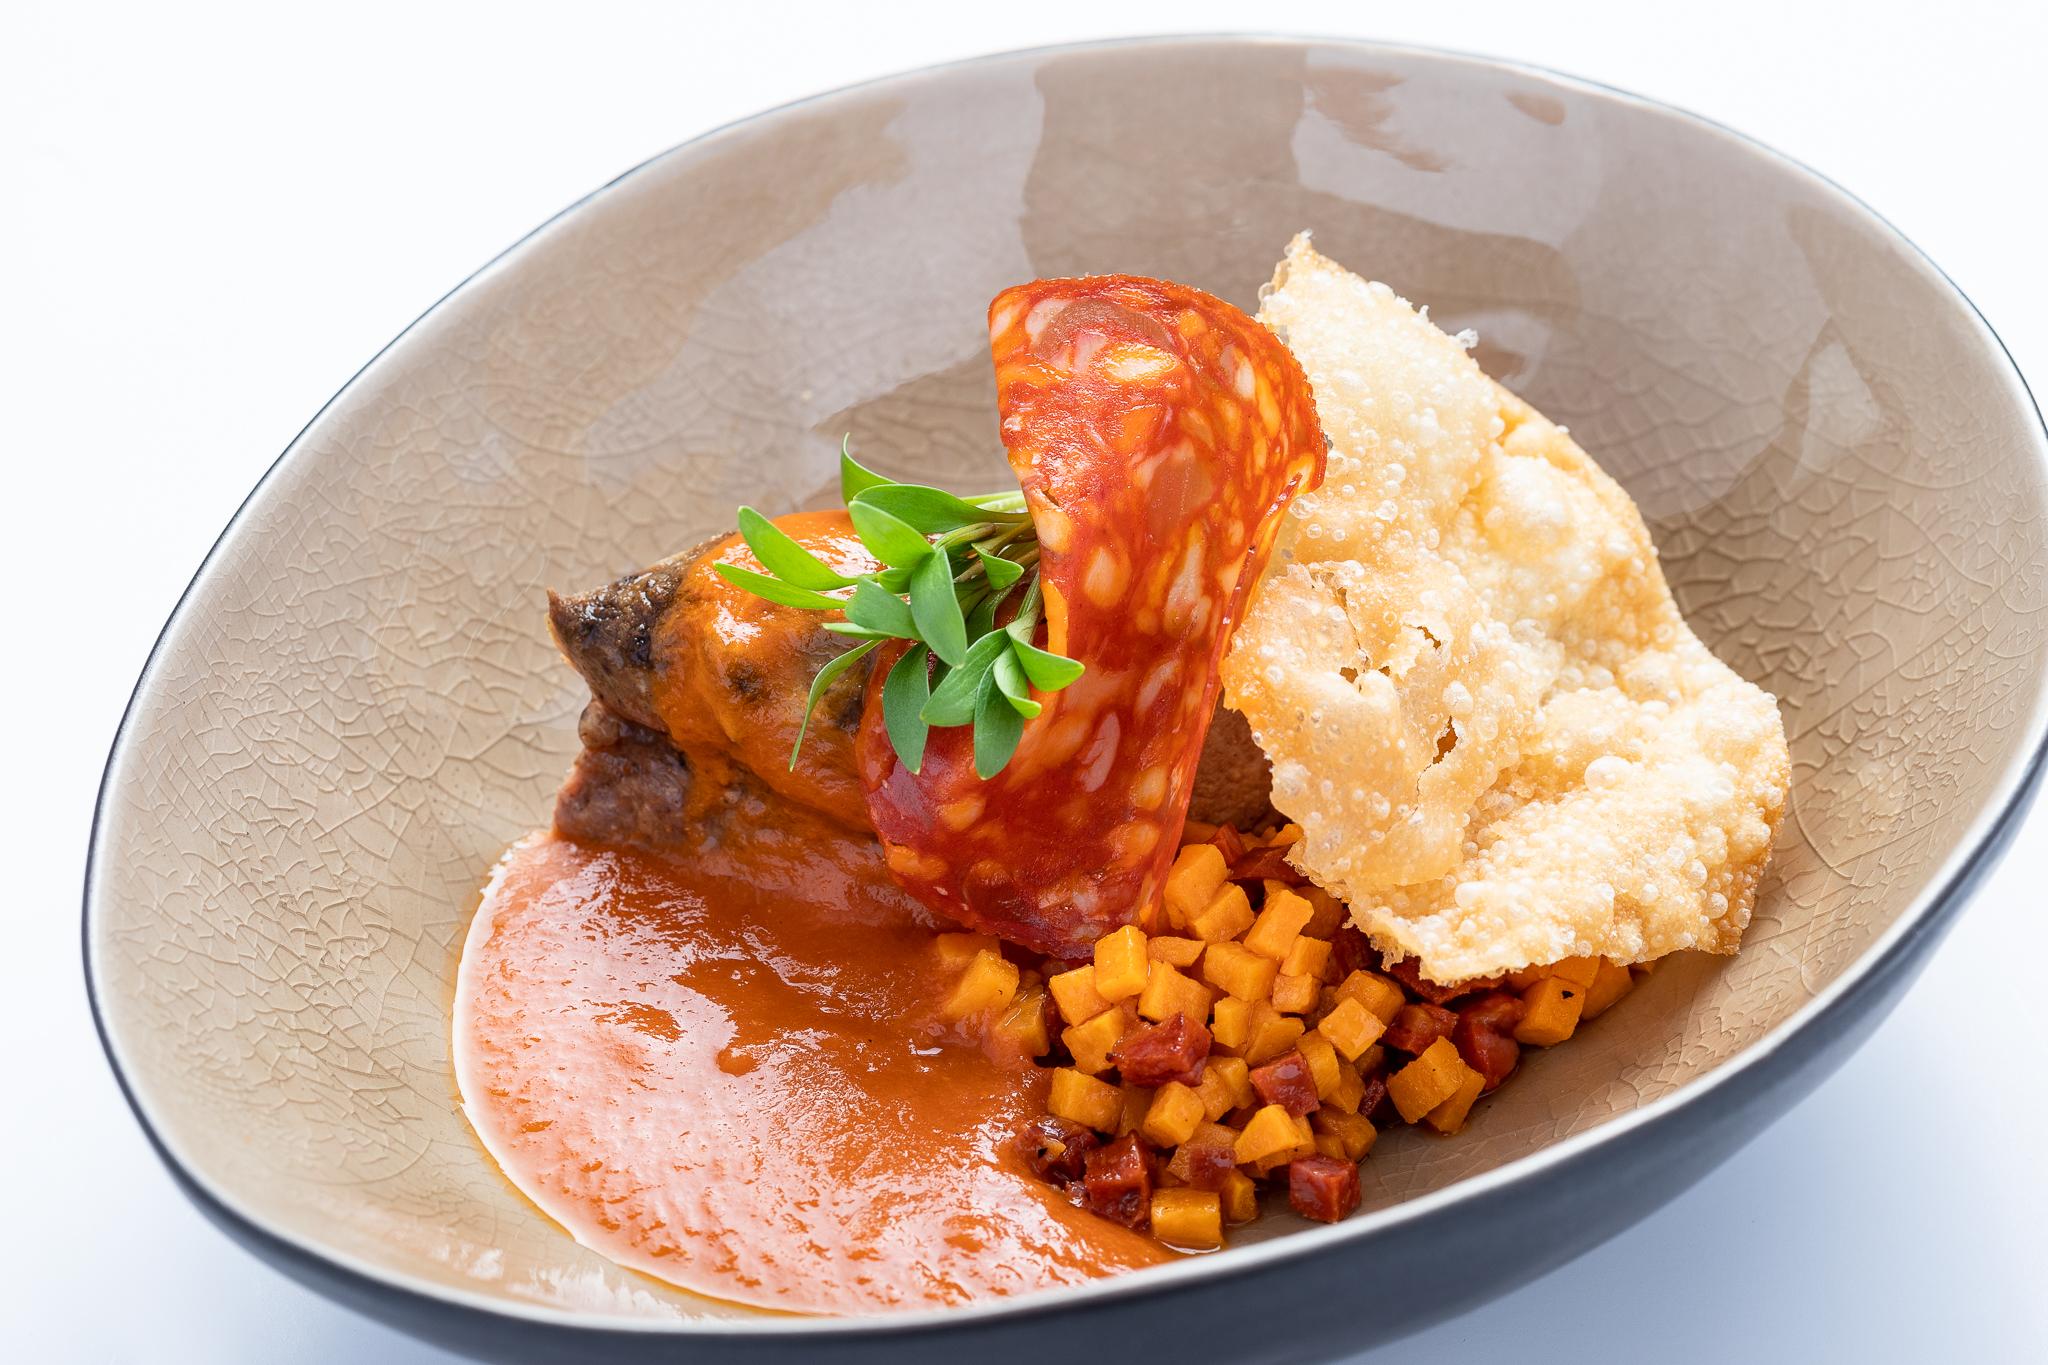 Slow cooked neck of lamb, sweet potato, chorizo, spicy tomato sauce - Goesepitte43